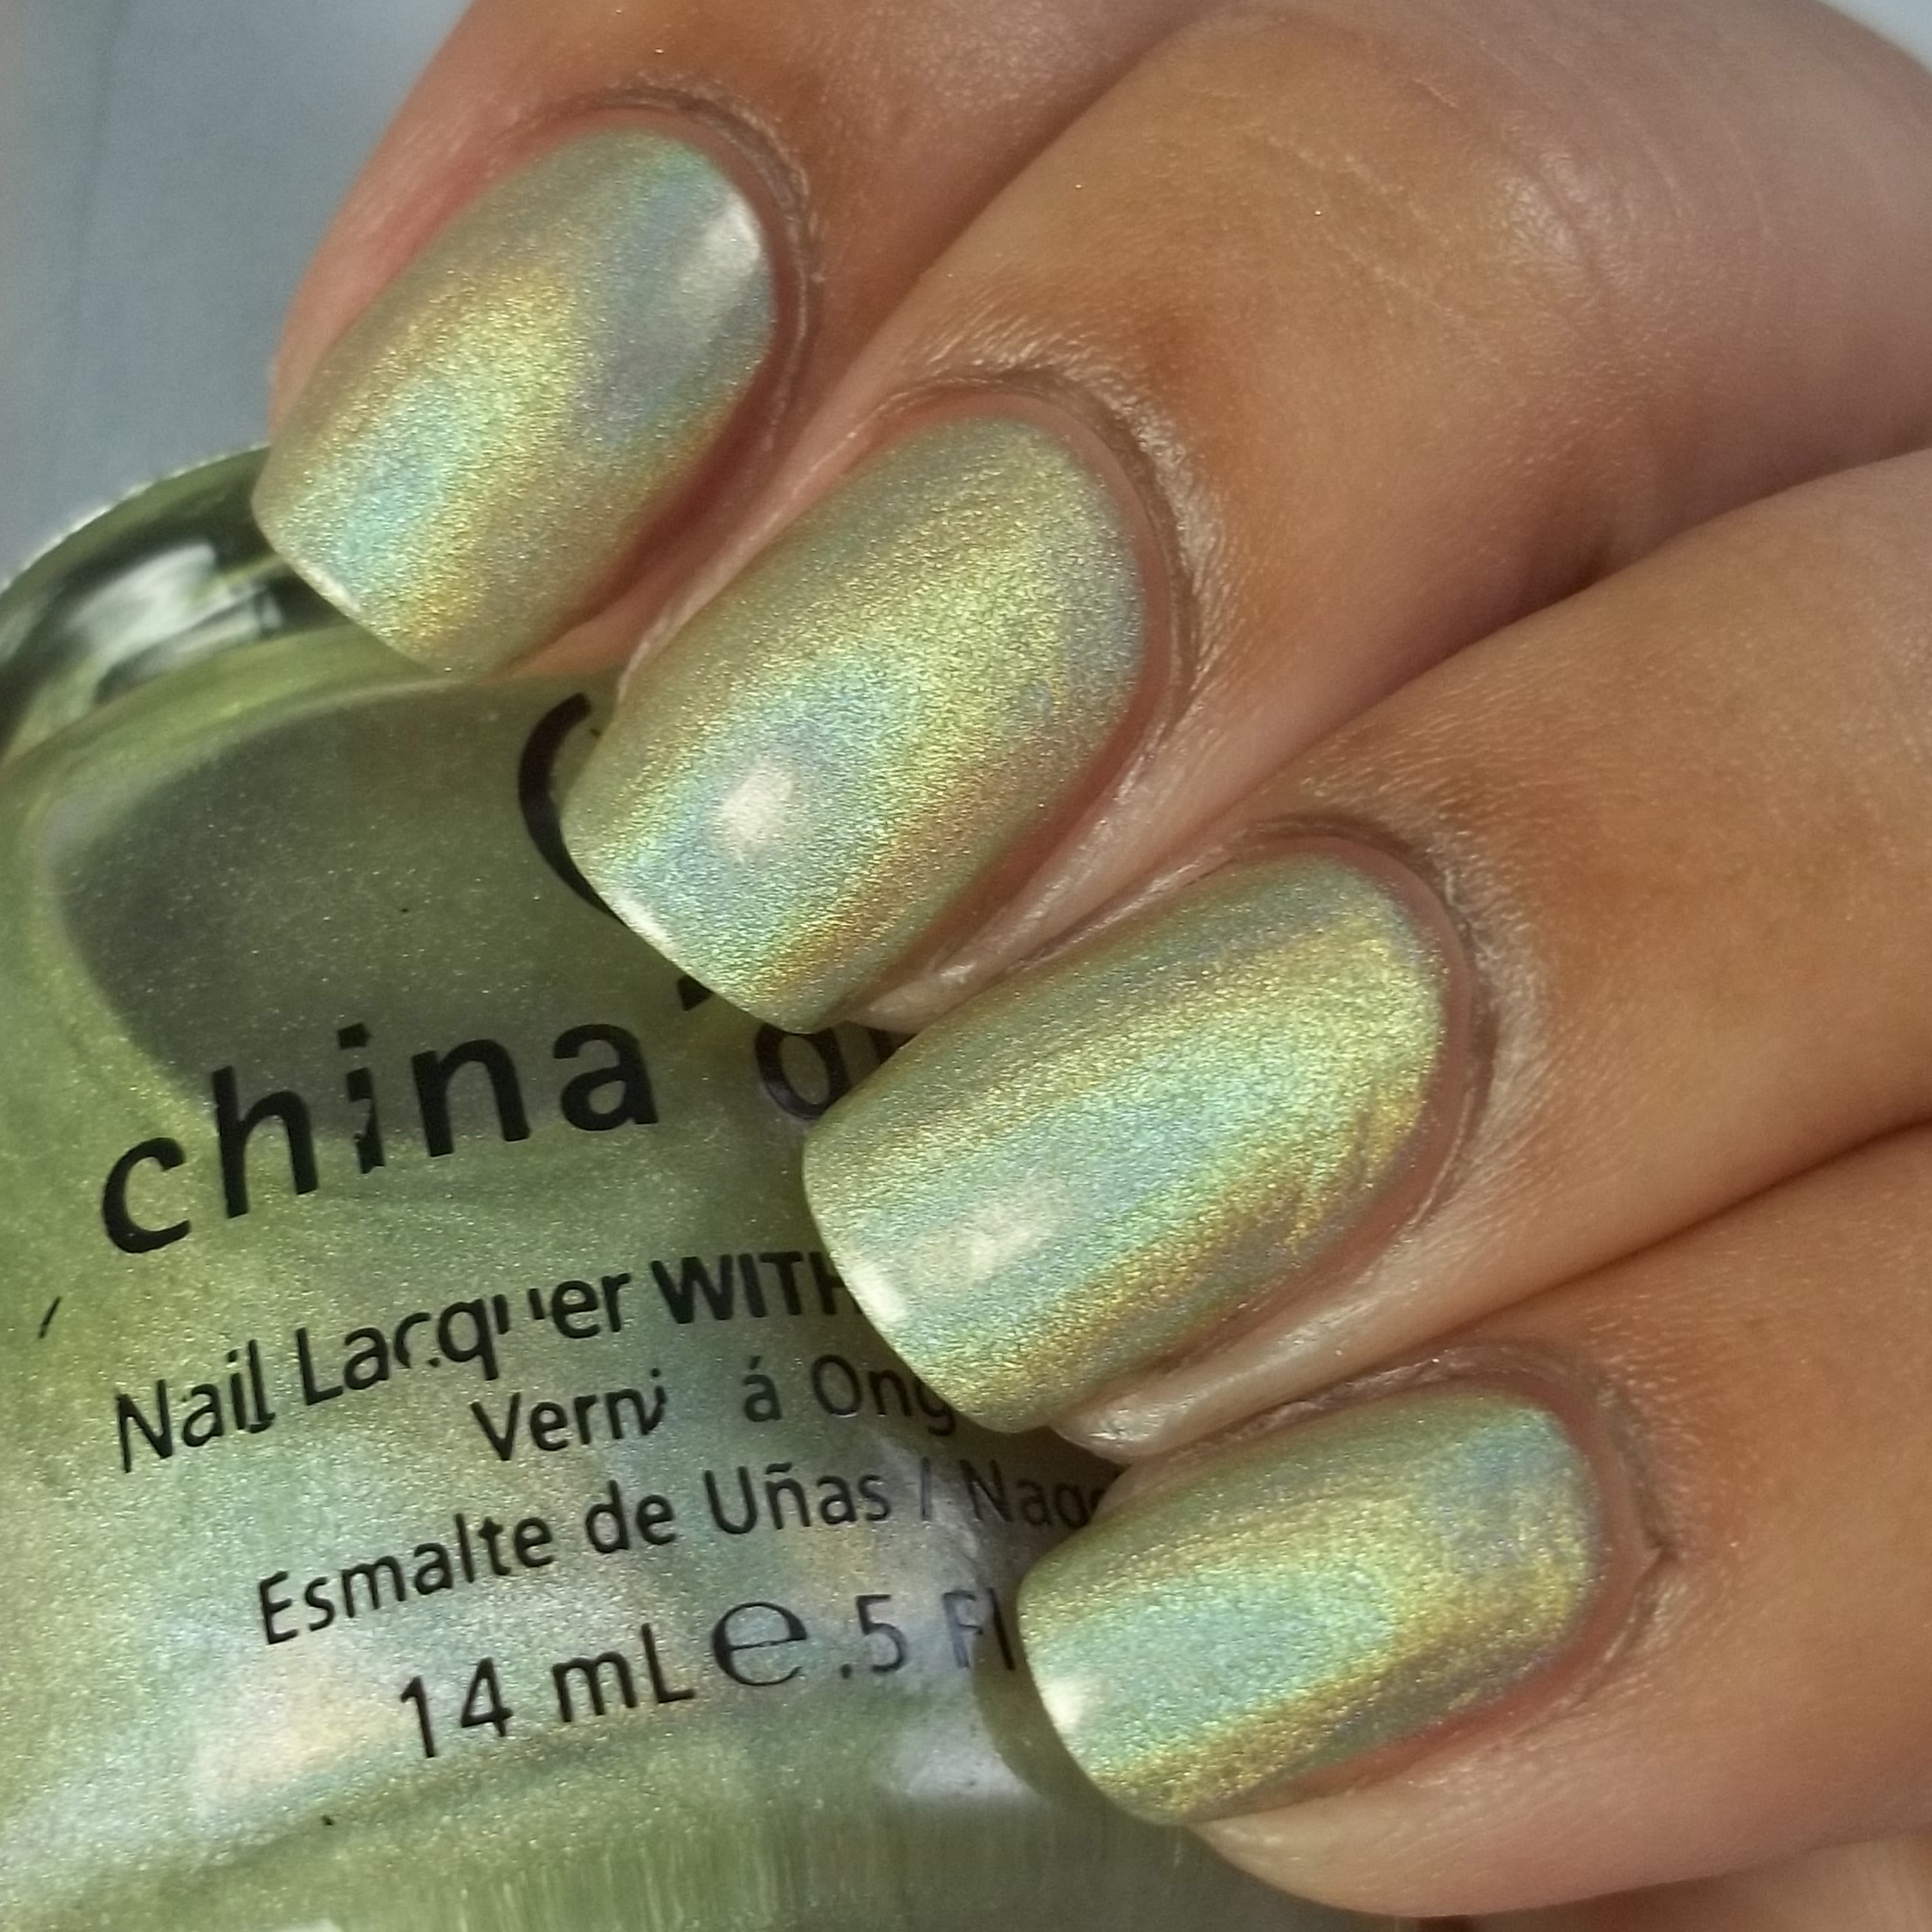 China Glaze OMG - L8R G8R.jpg